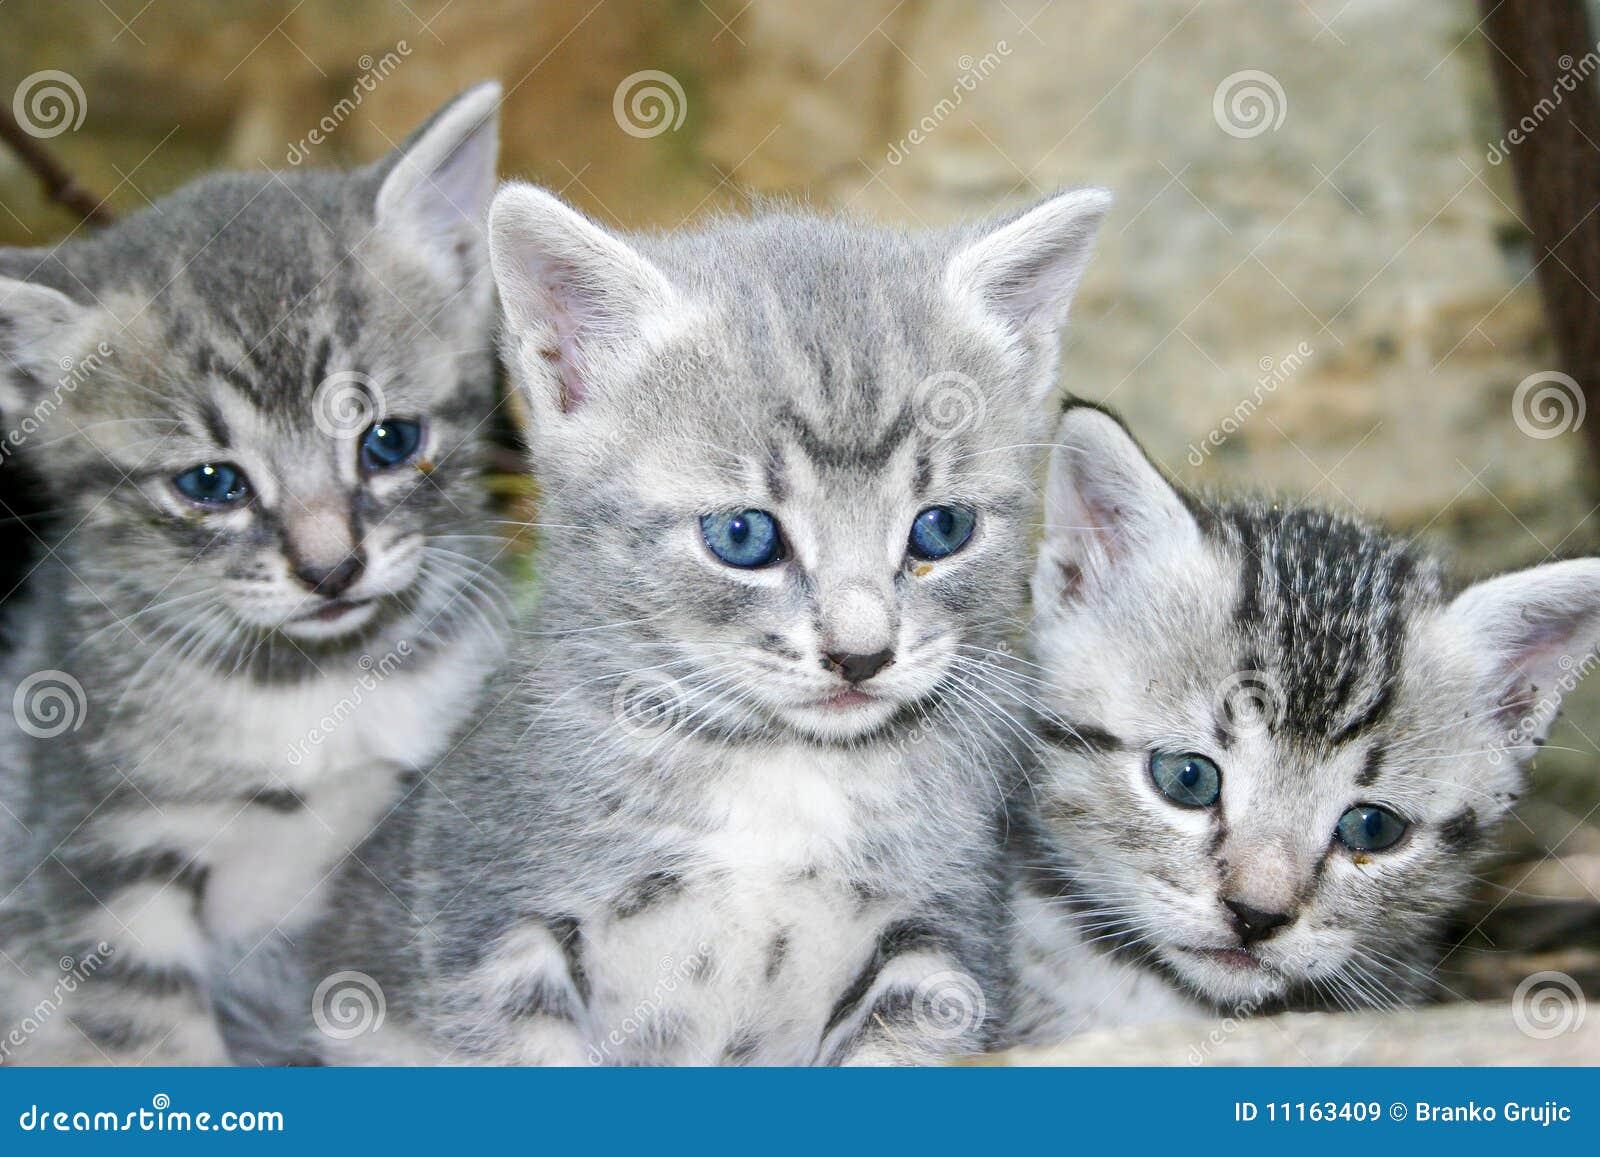 gatos bonitos related keywords - photo #11